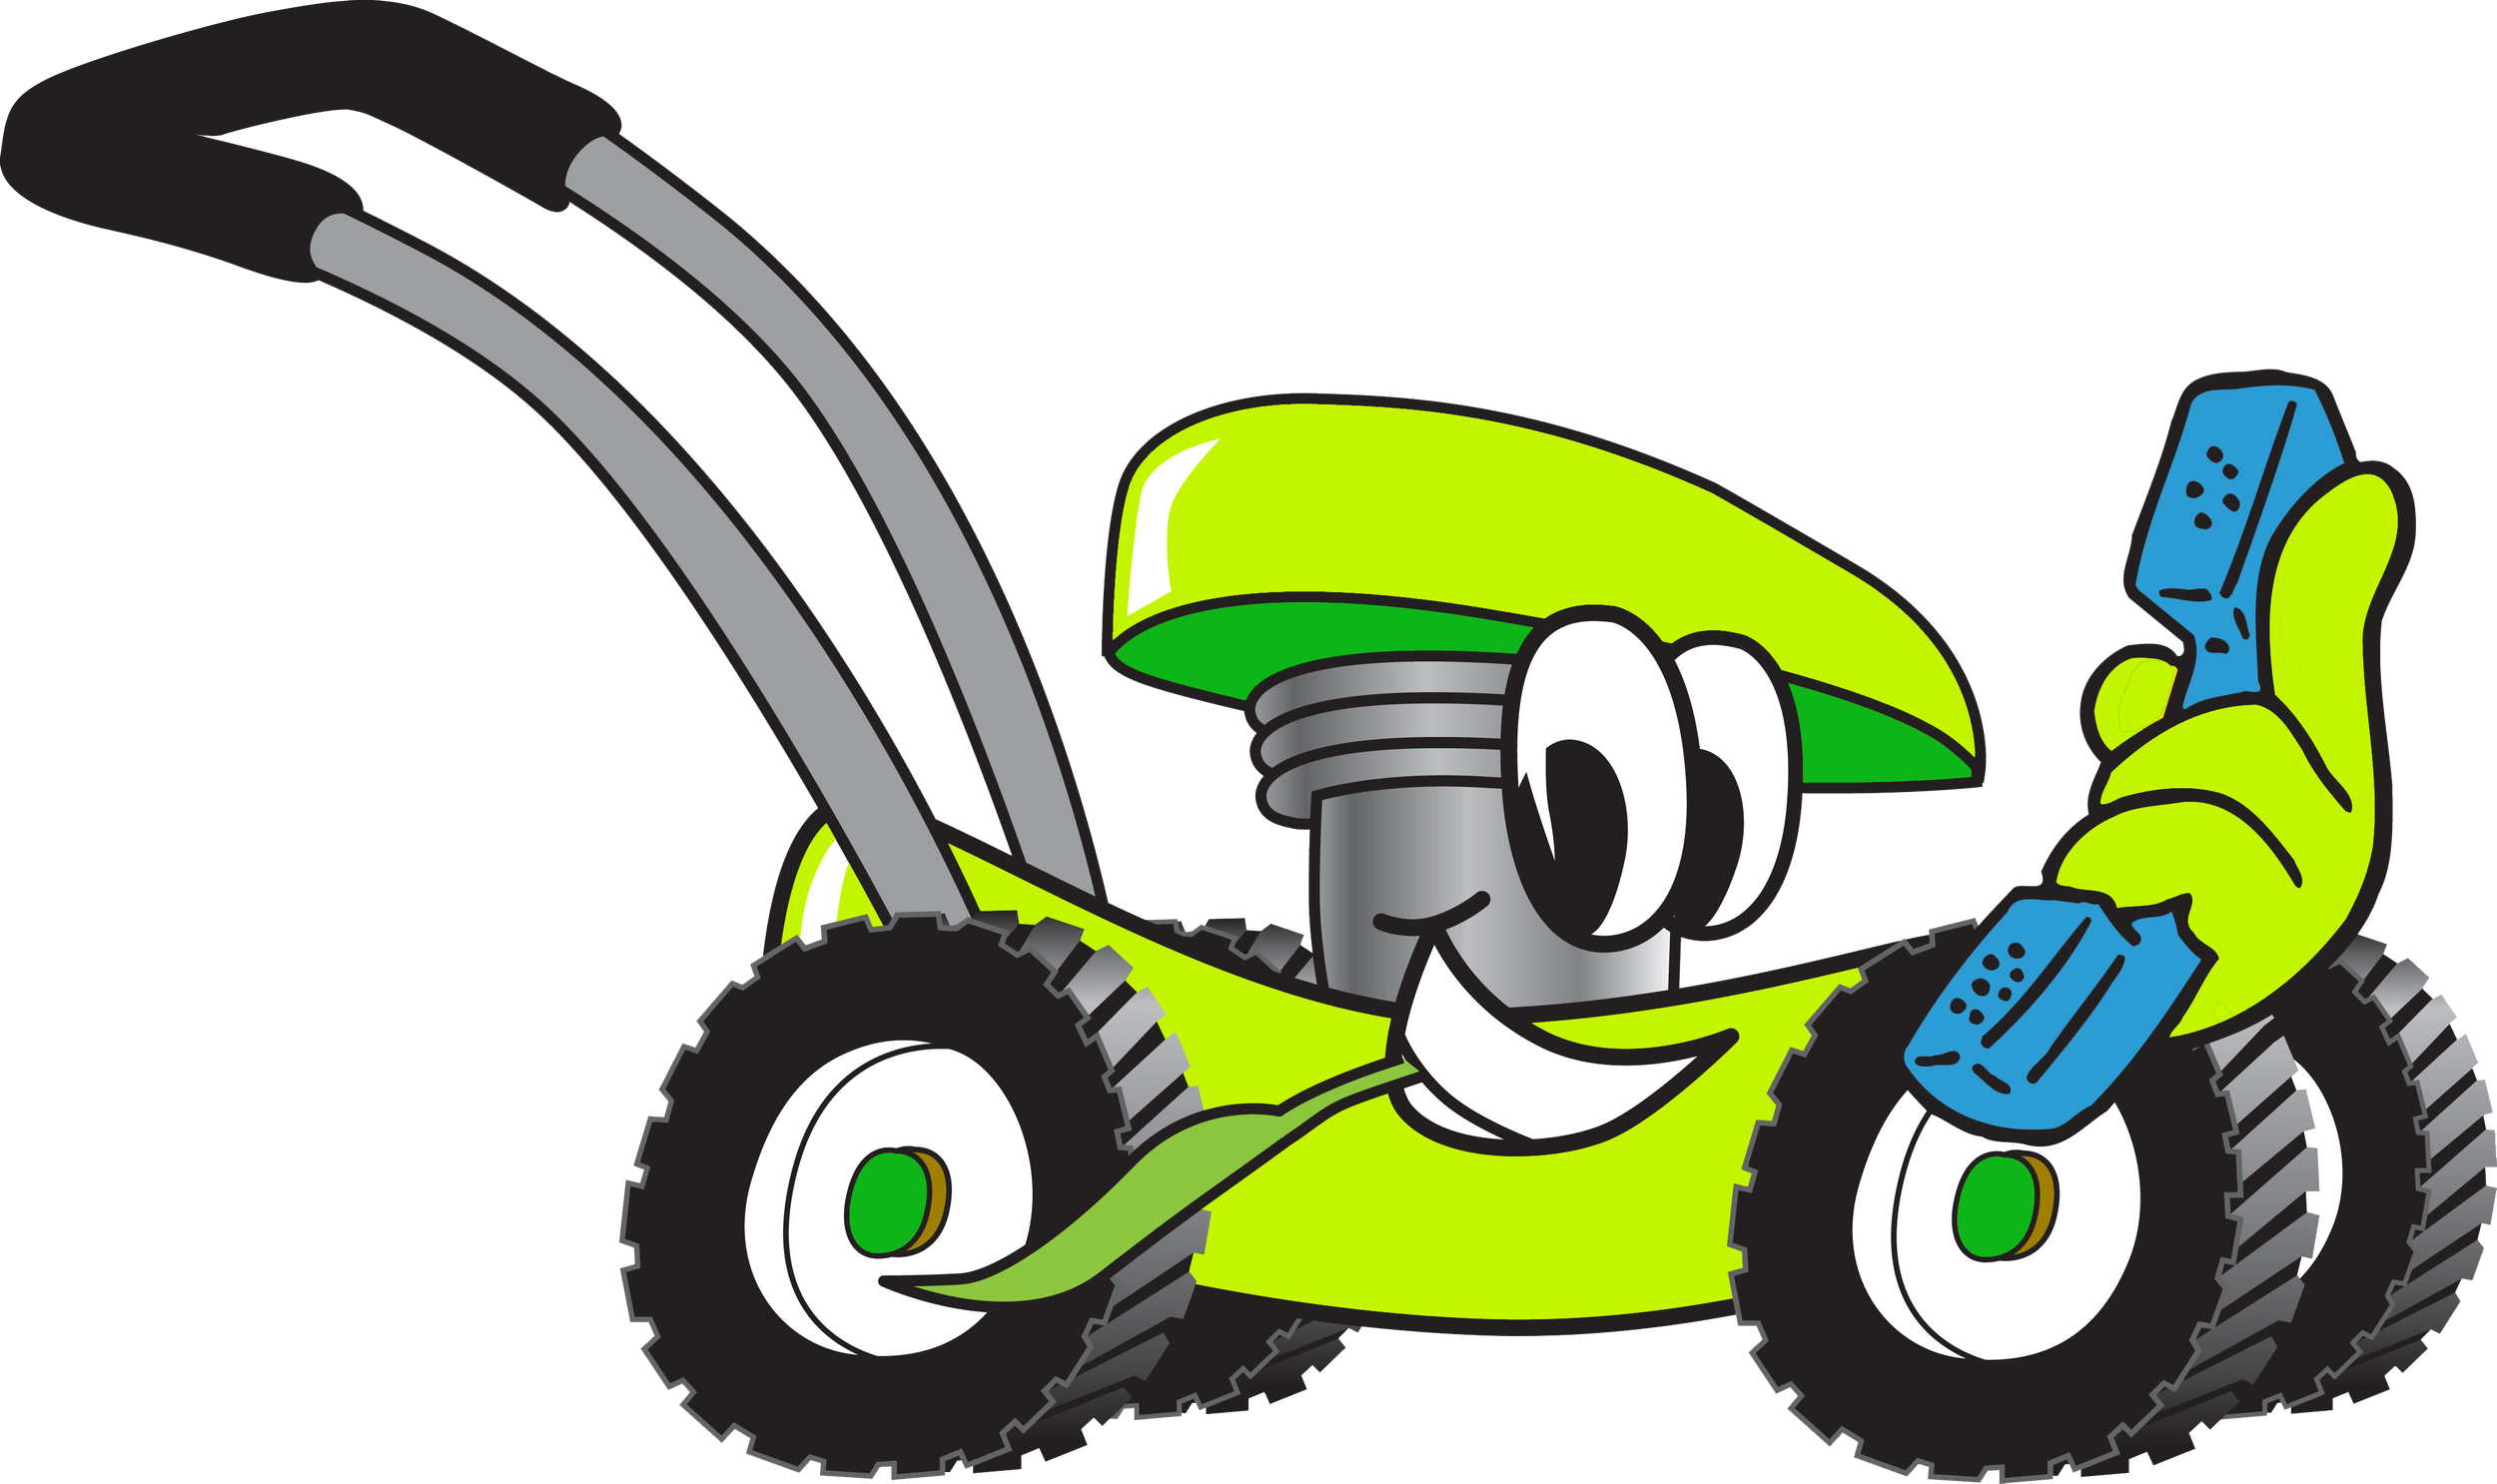 Transparent tire tread clipart - Cartoon Lawn Mower Clip Art